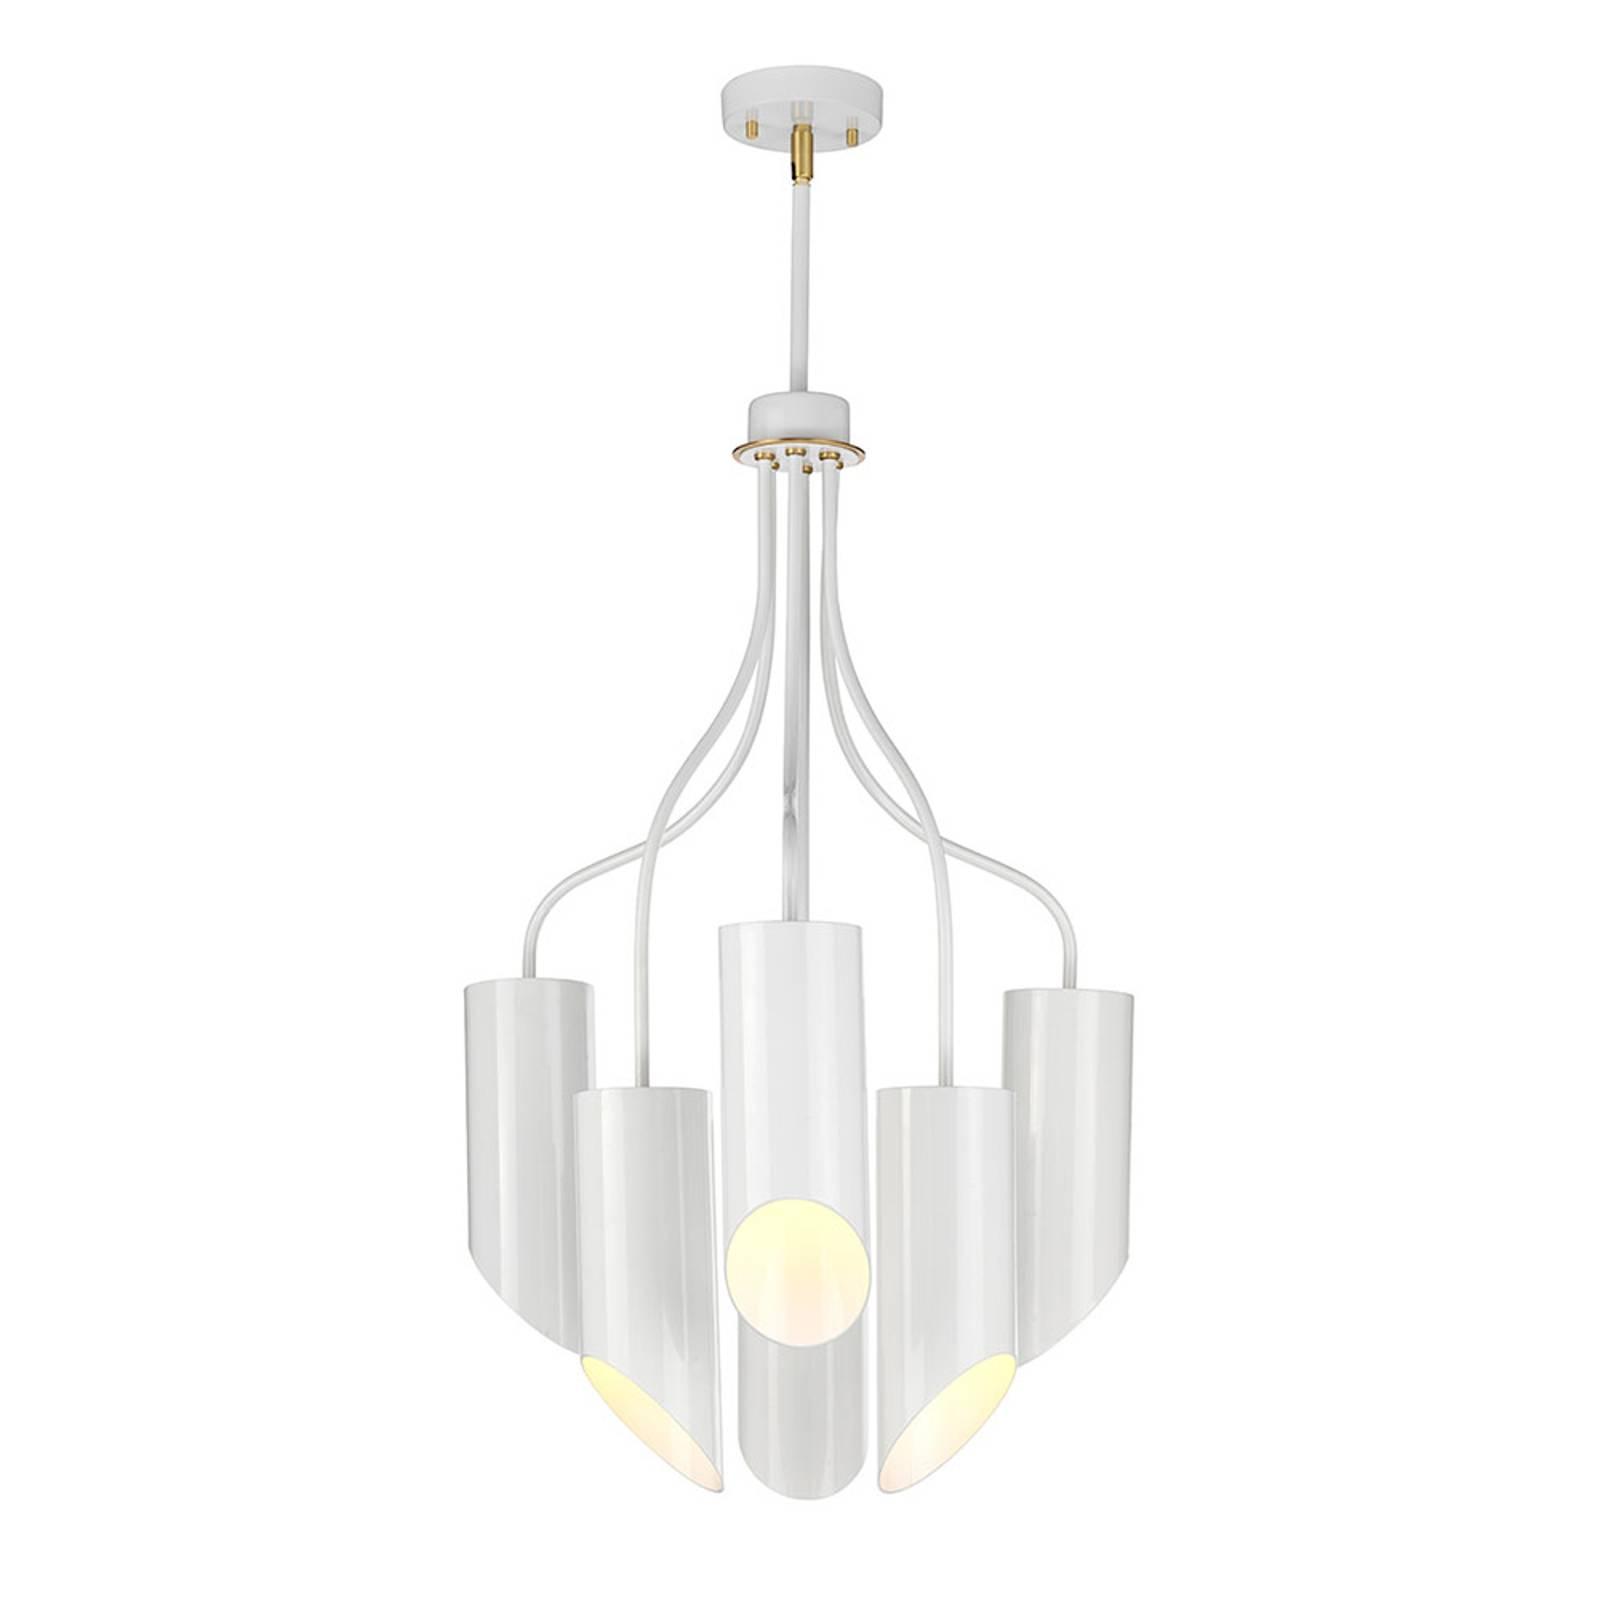 Riippuvalo Quinto 6-lamp, valkoinen/messinki